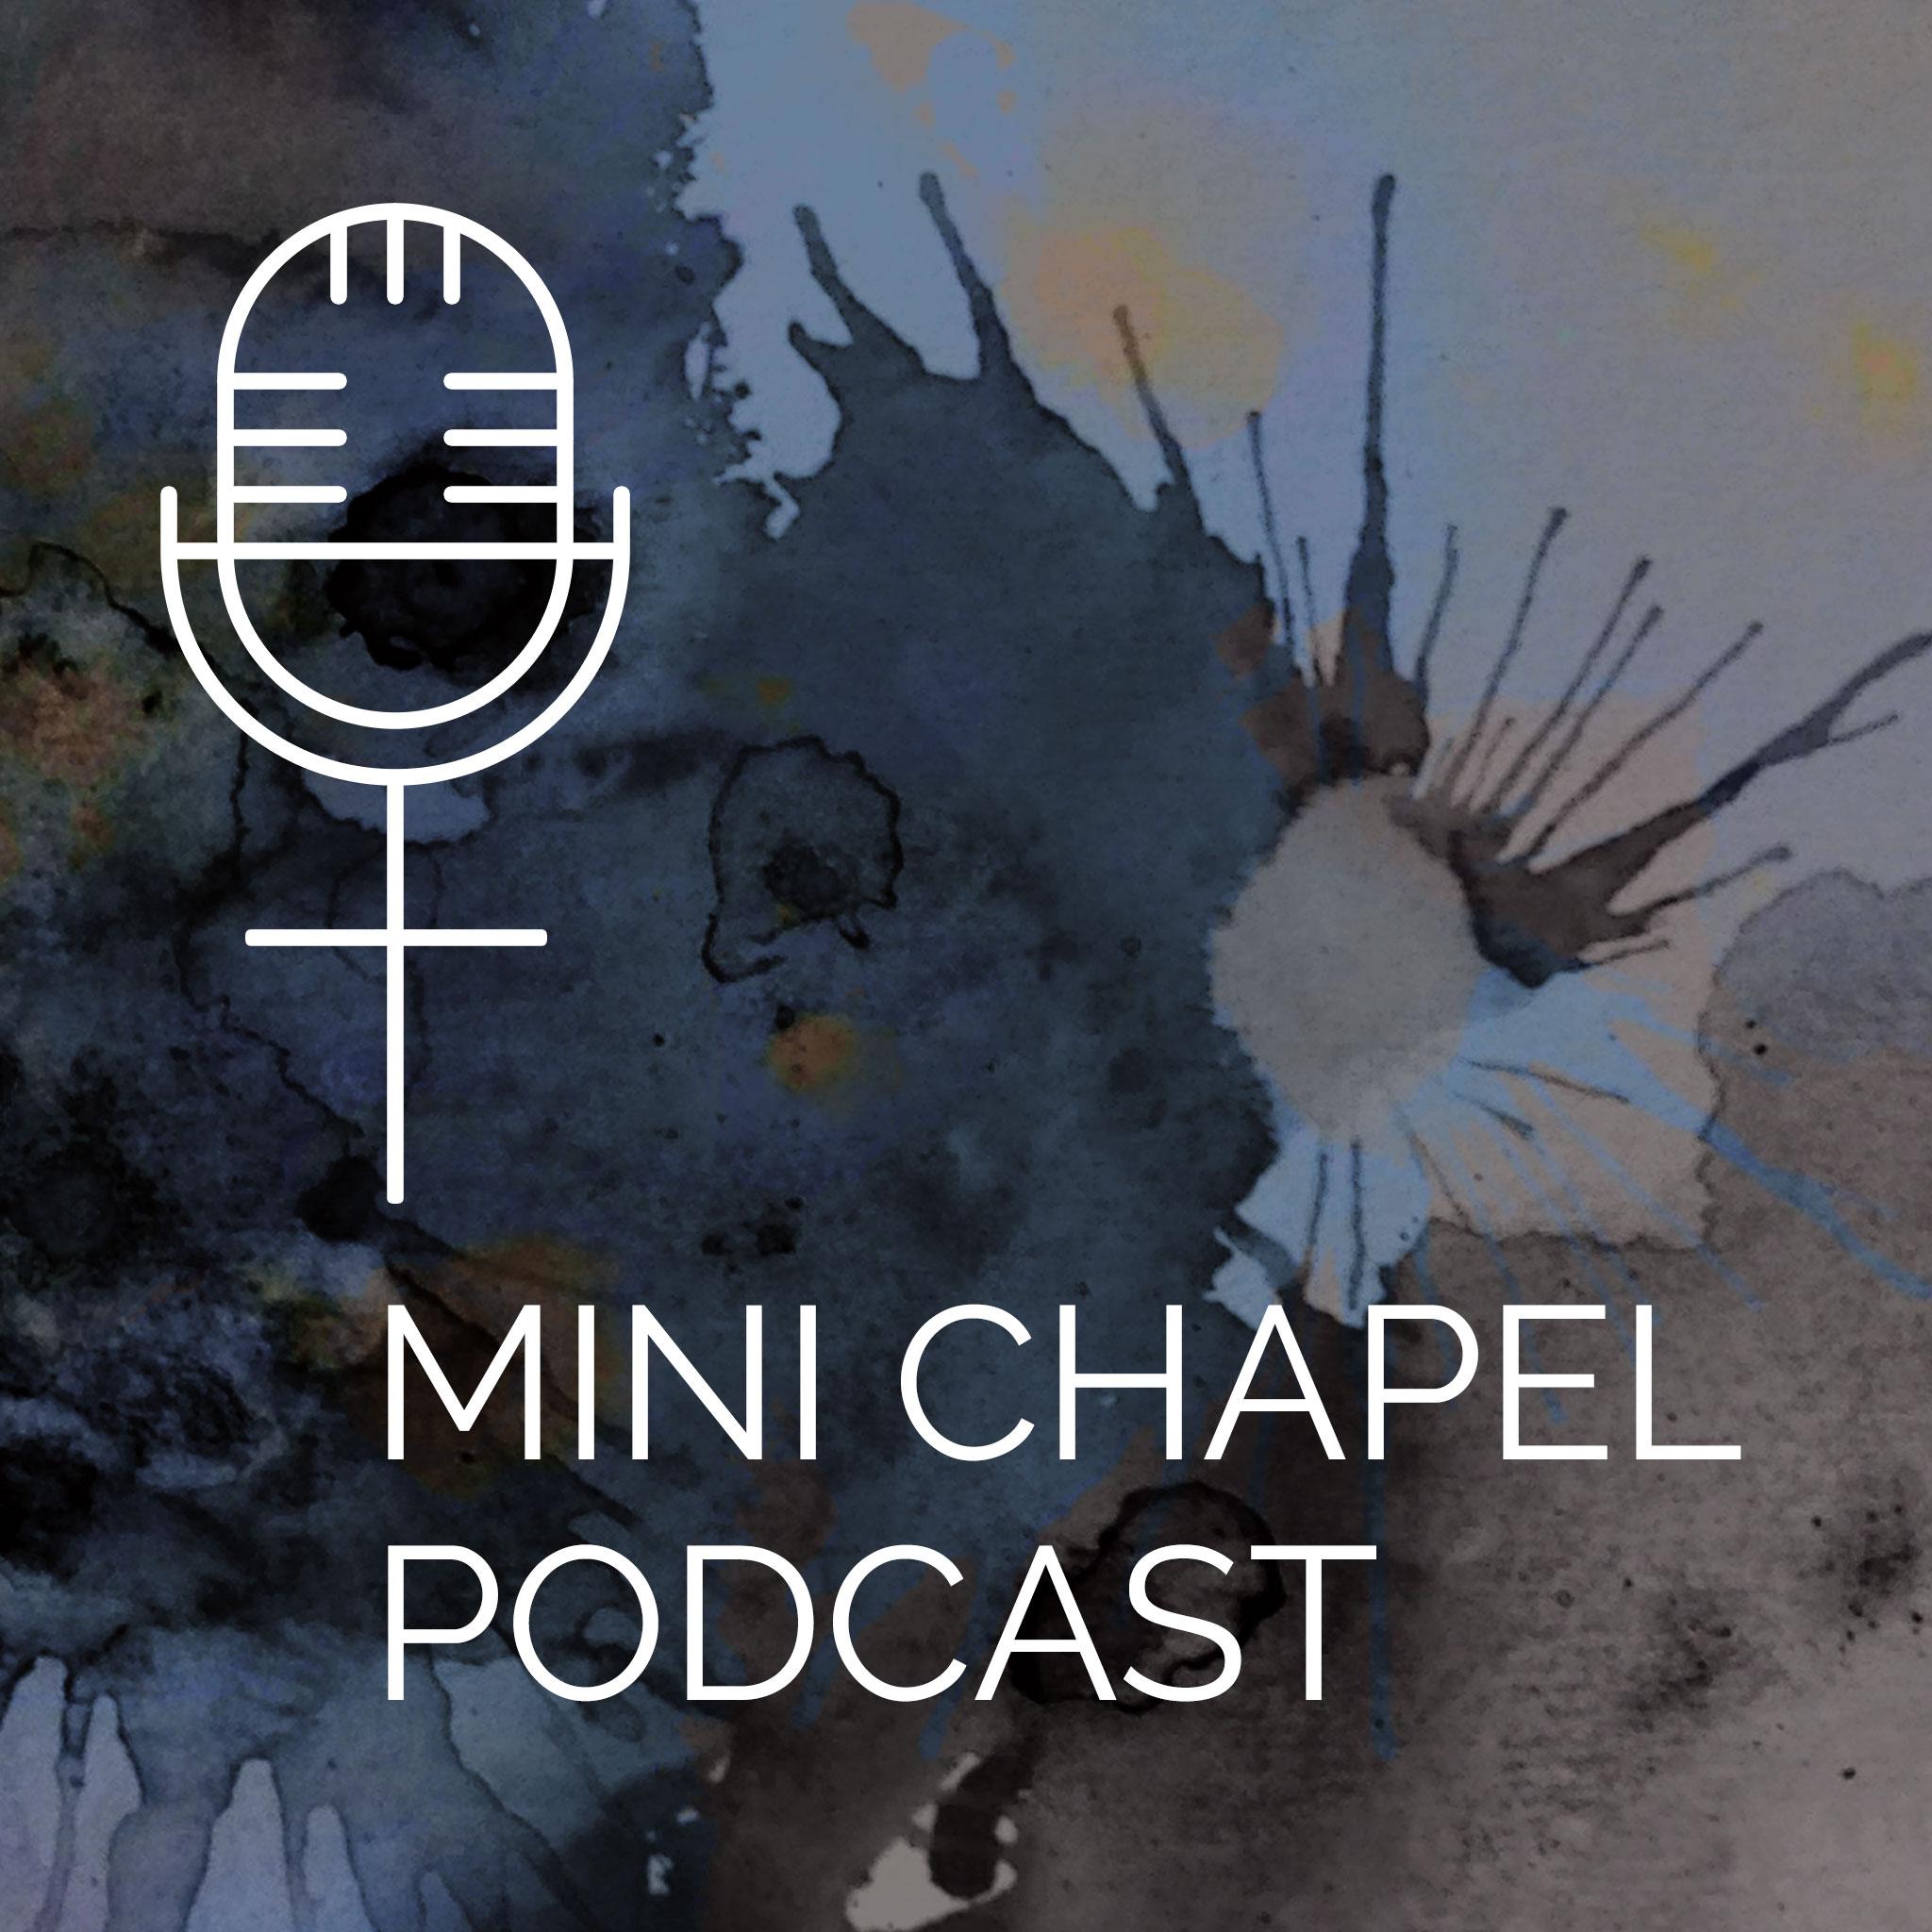 Mini Chapel Podcast